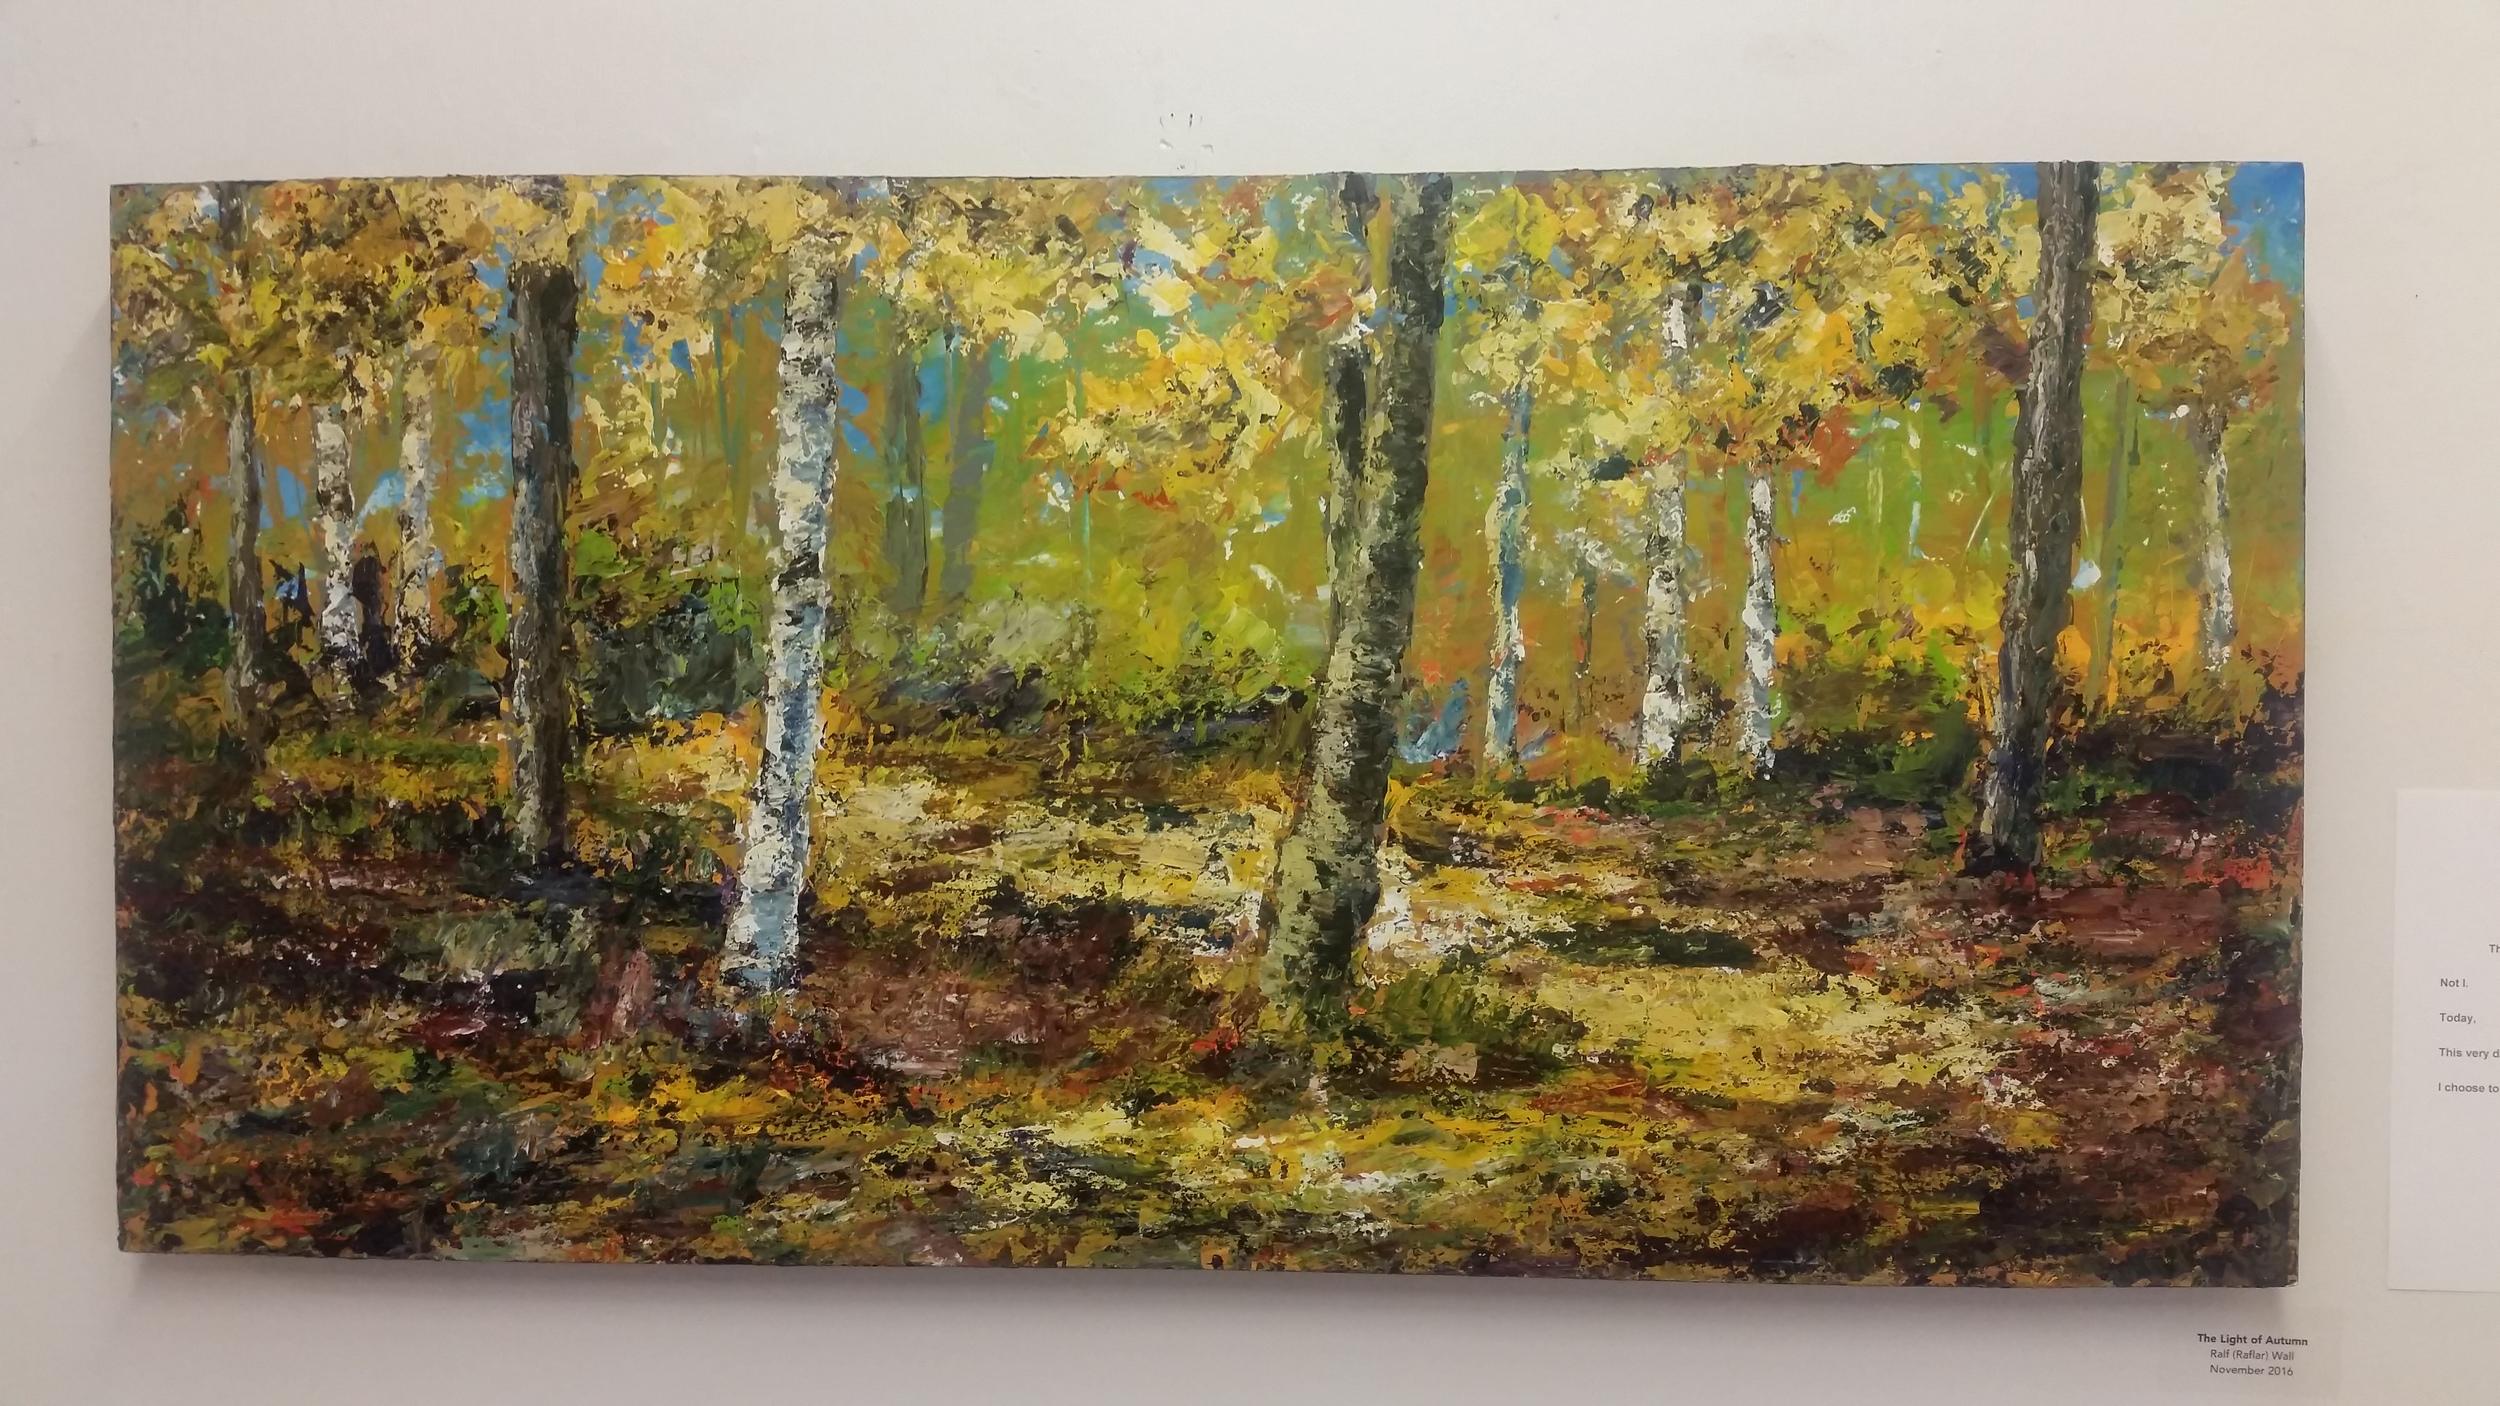 The Light of Autumn by Ralf (Raflar) Wall